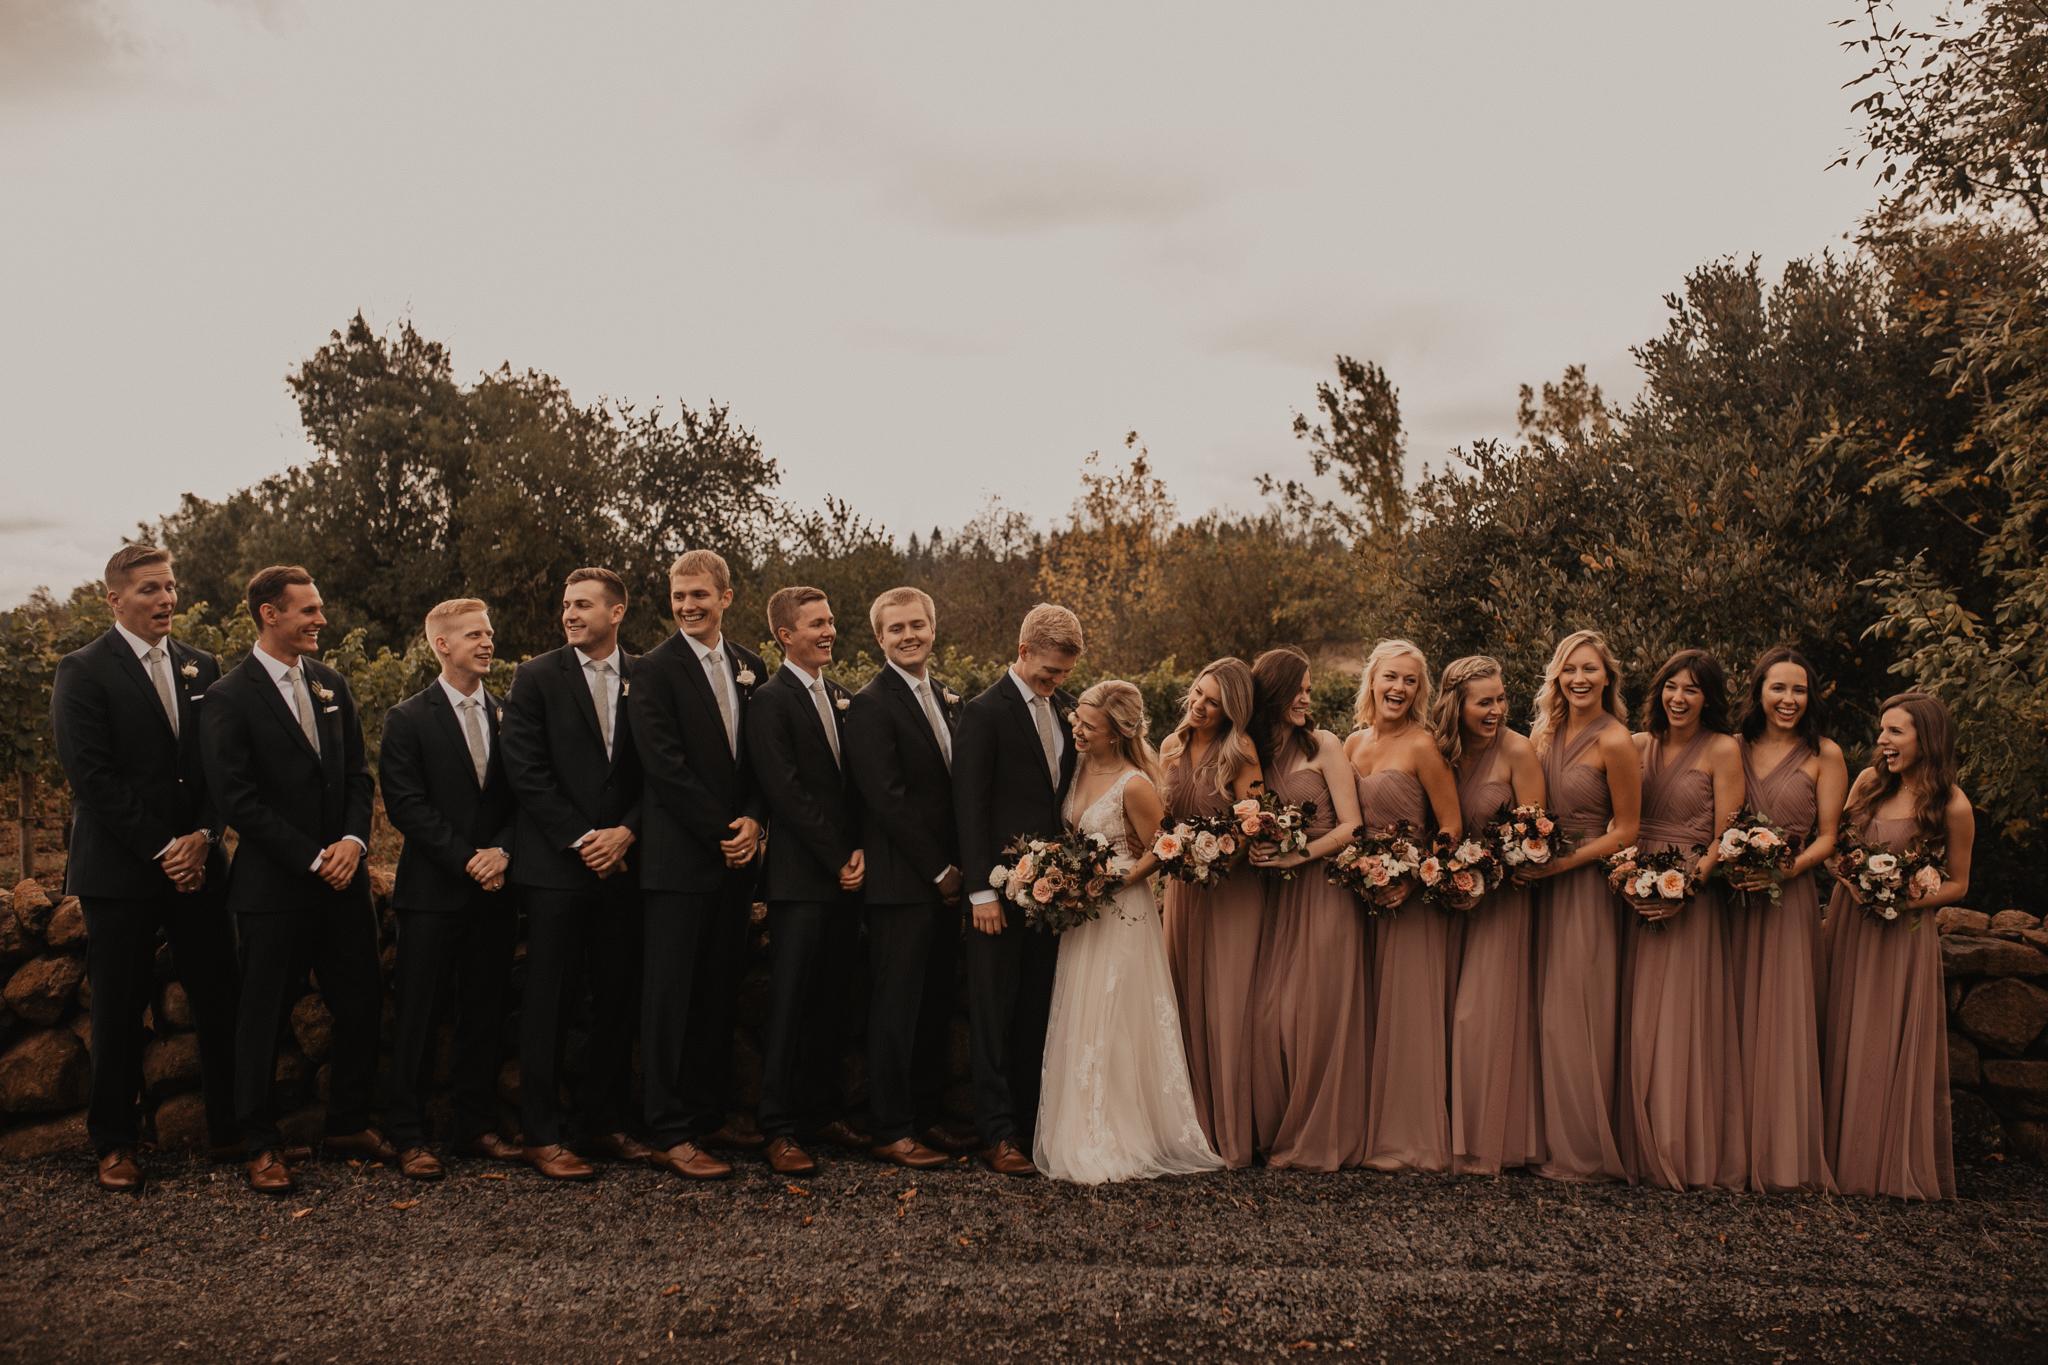 Zenith Vineyard wedding party photos